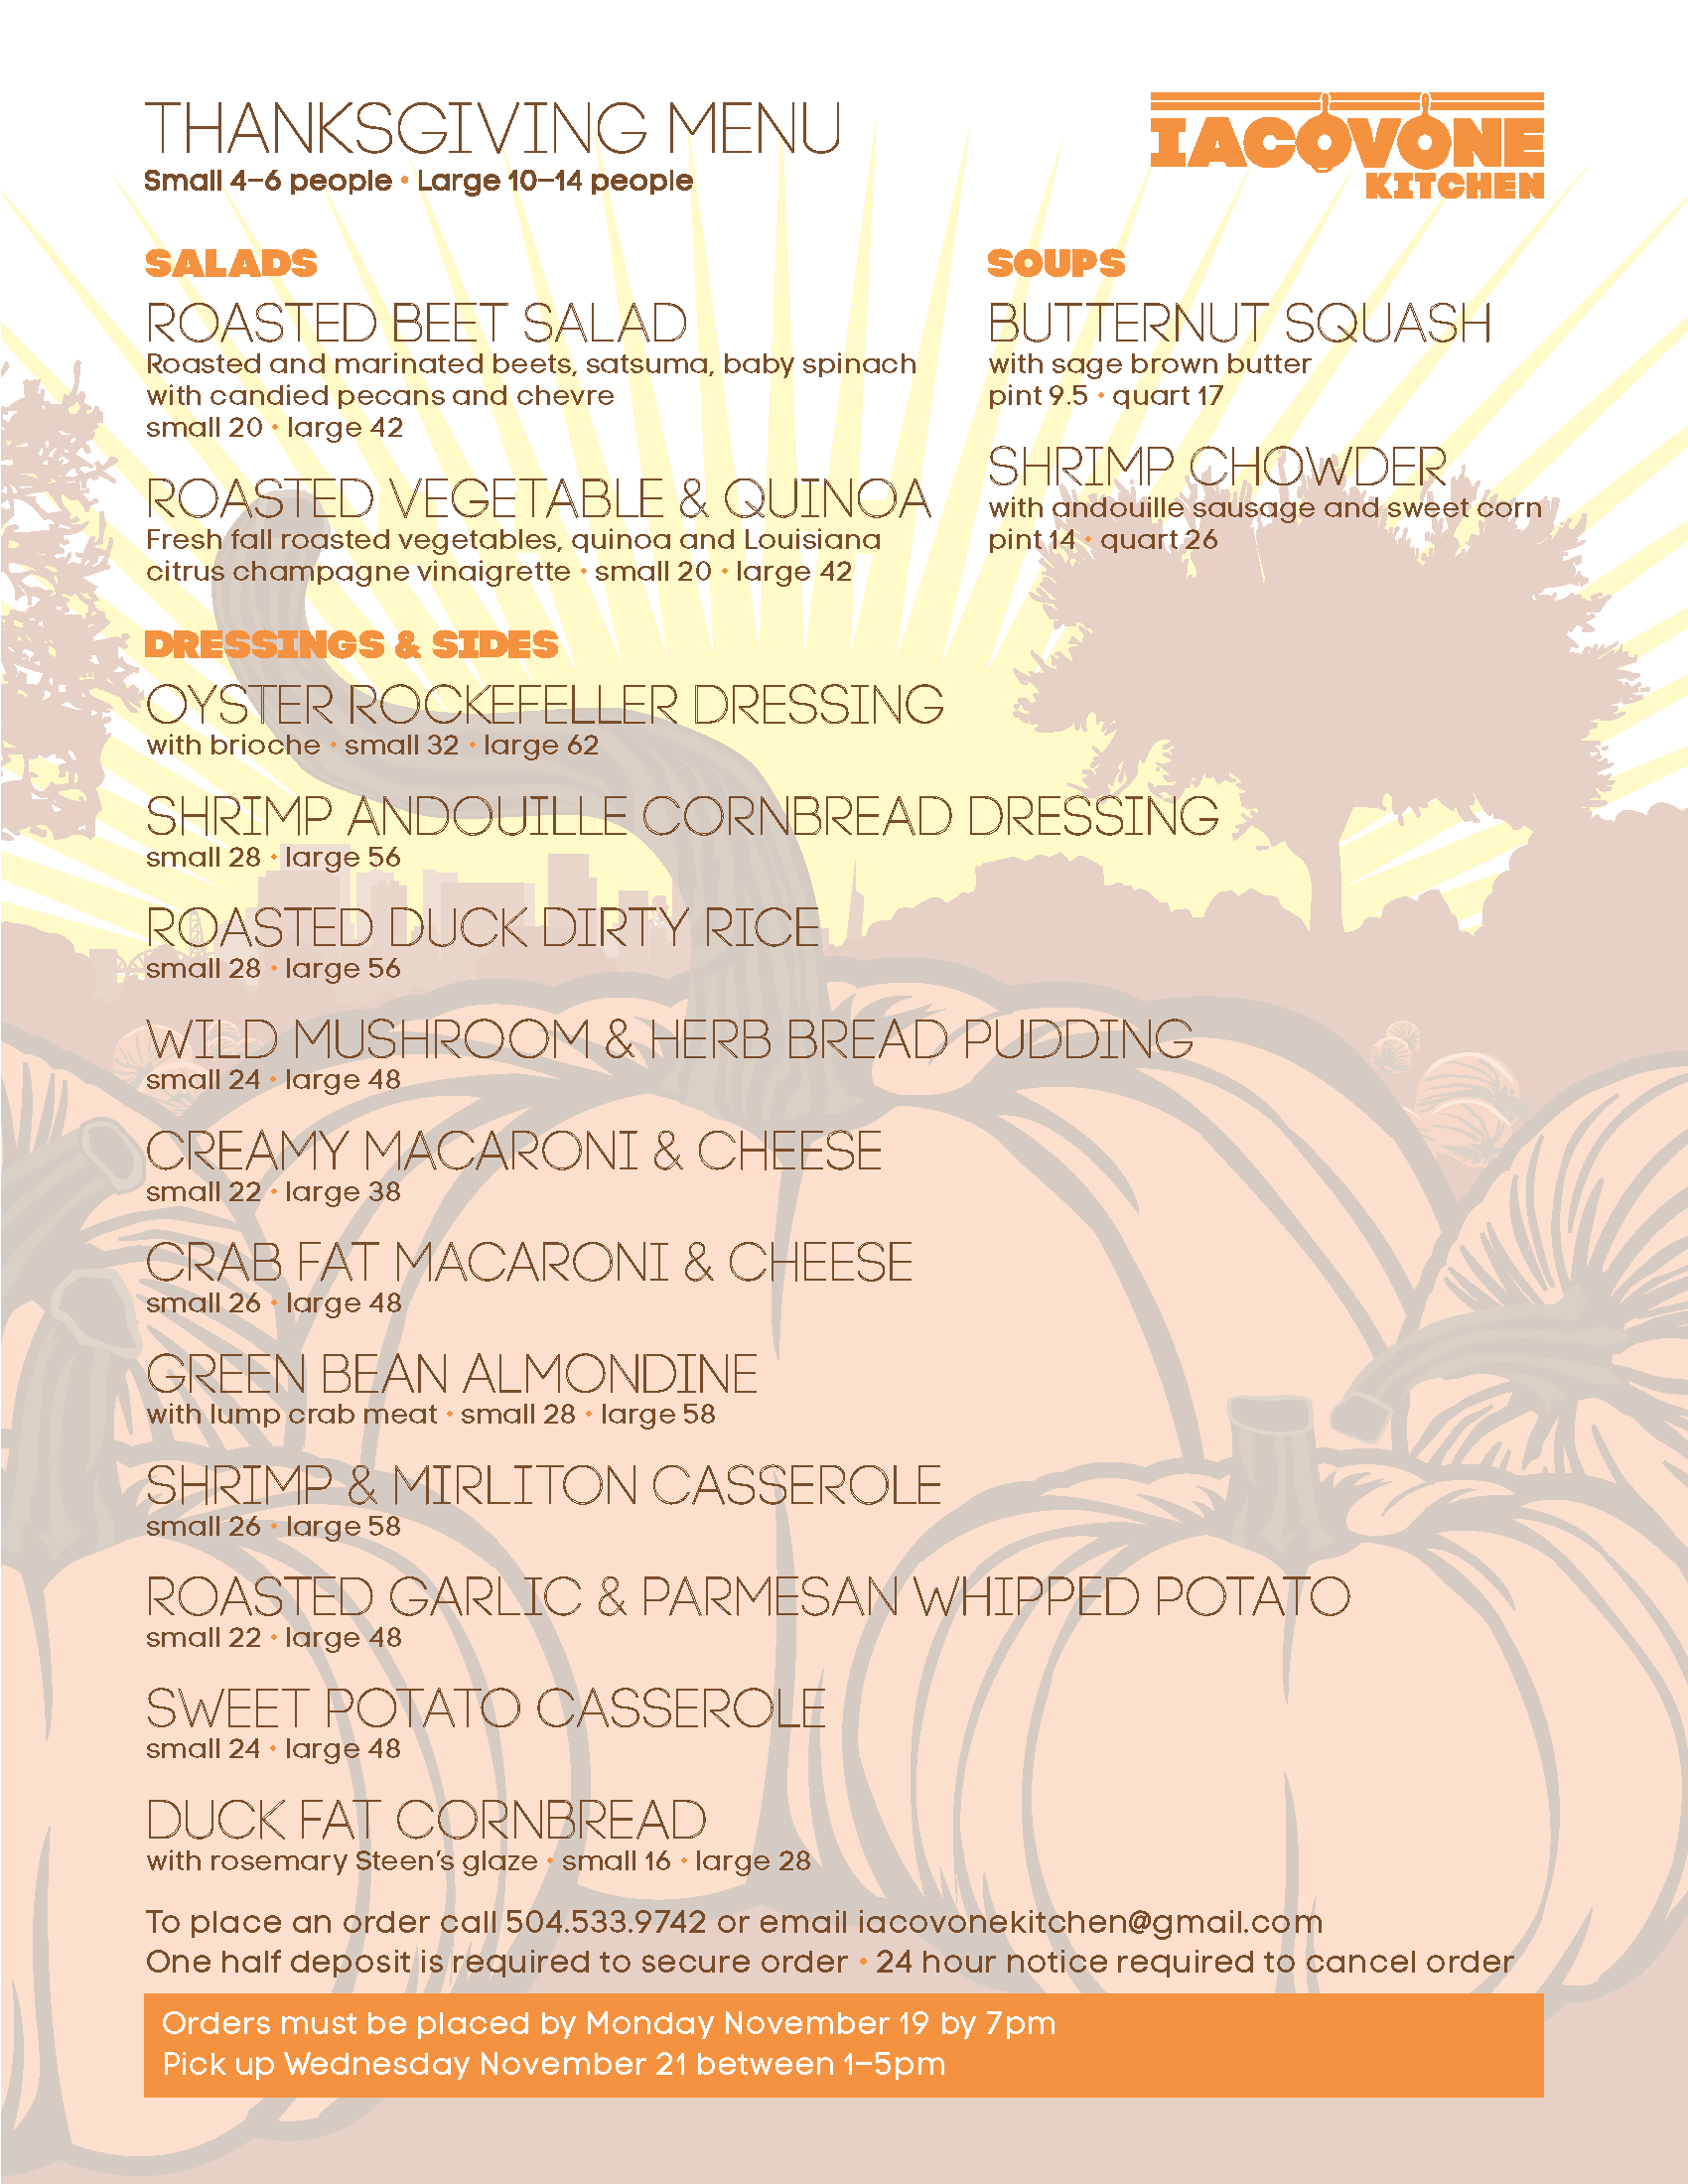 iK_thanksgiving2018_menuPumpkins.png